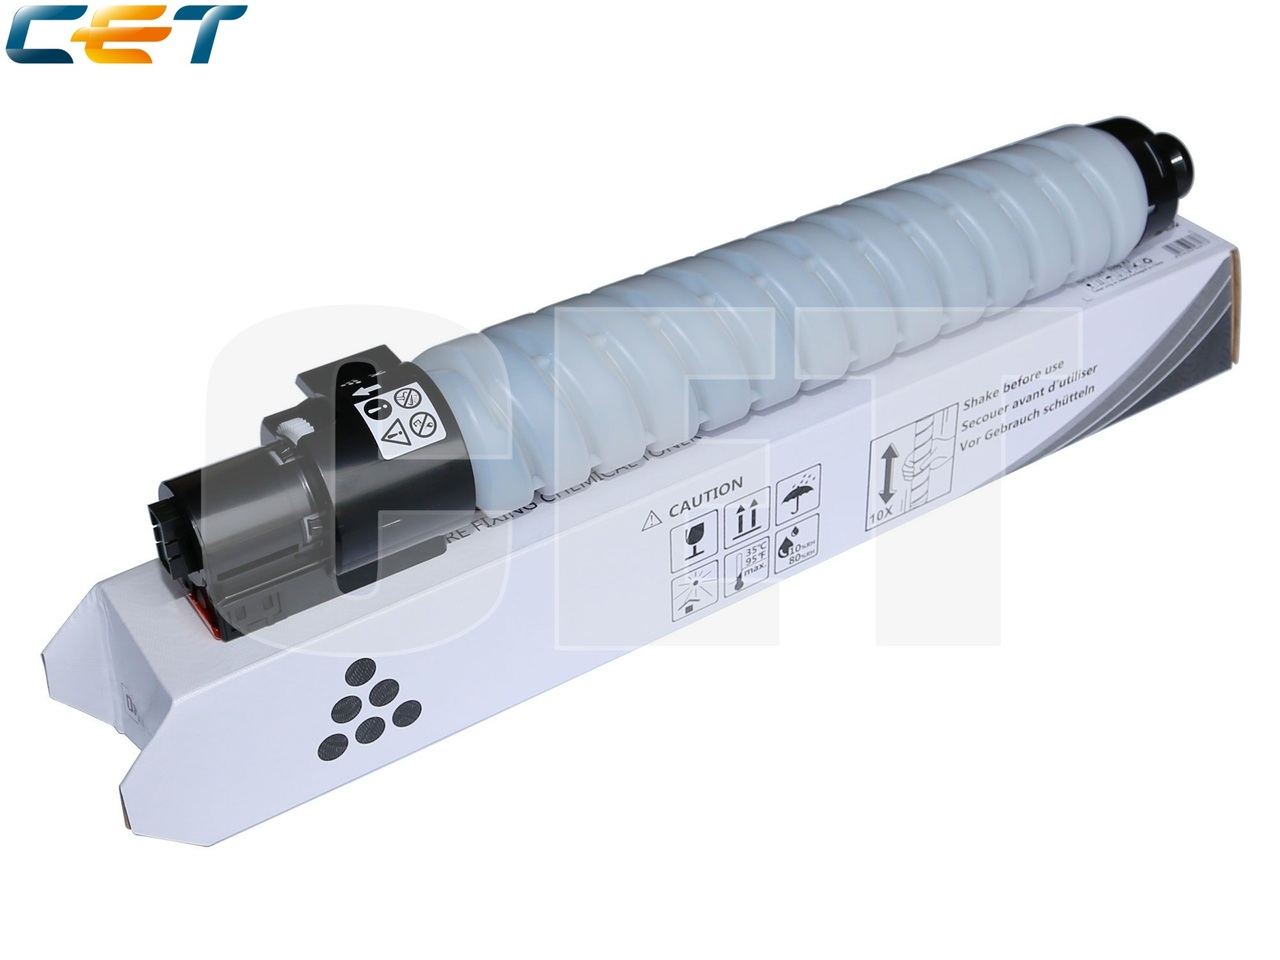 Тонер-картридж (CPT) 841160 для RICOH Aficio MPC4000/5000(CET) Black, (WW), 510г, 23000 стр., CET6817K